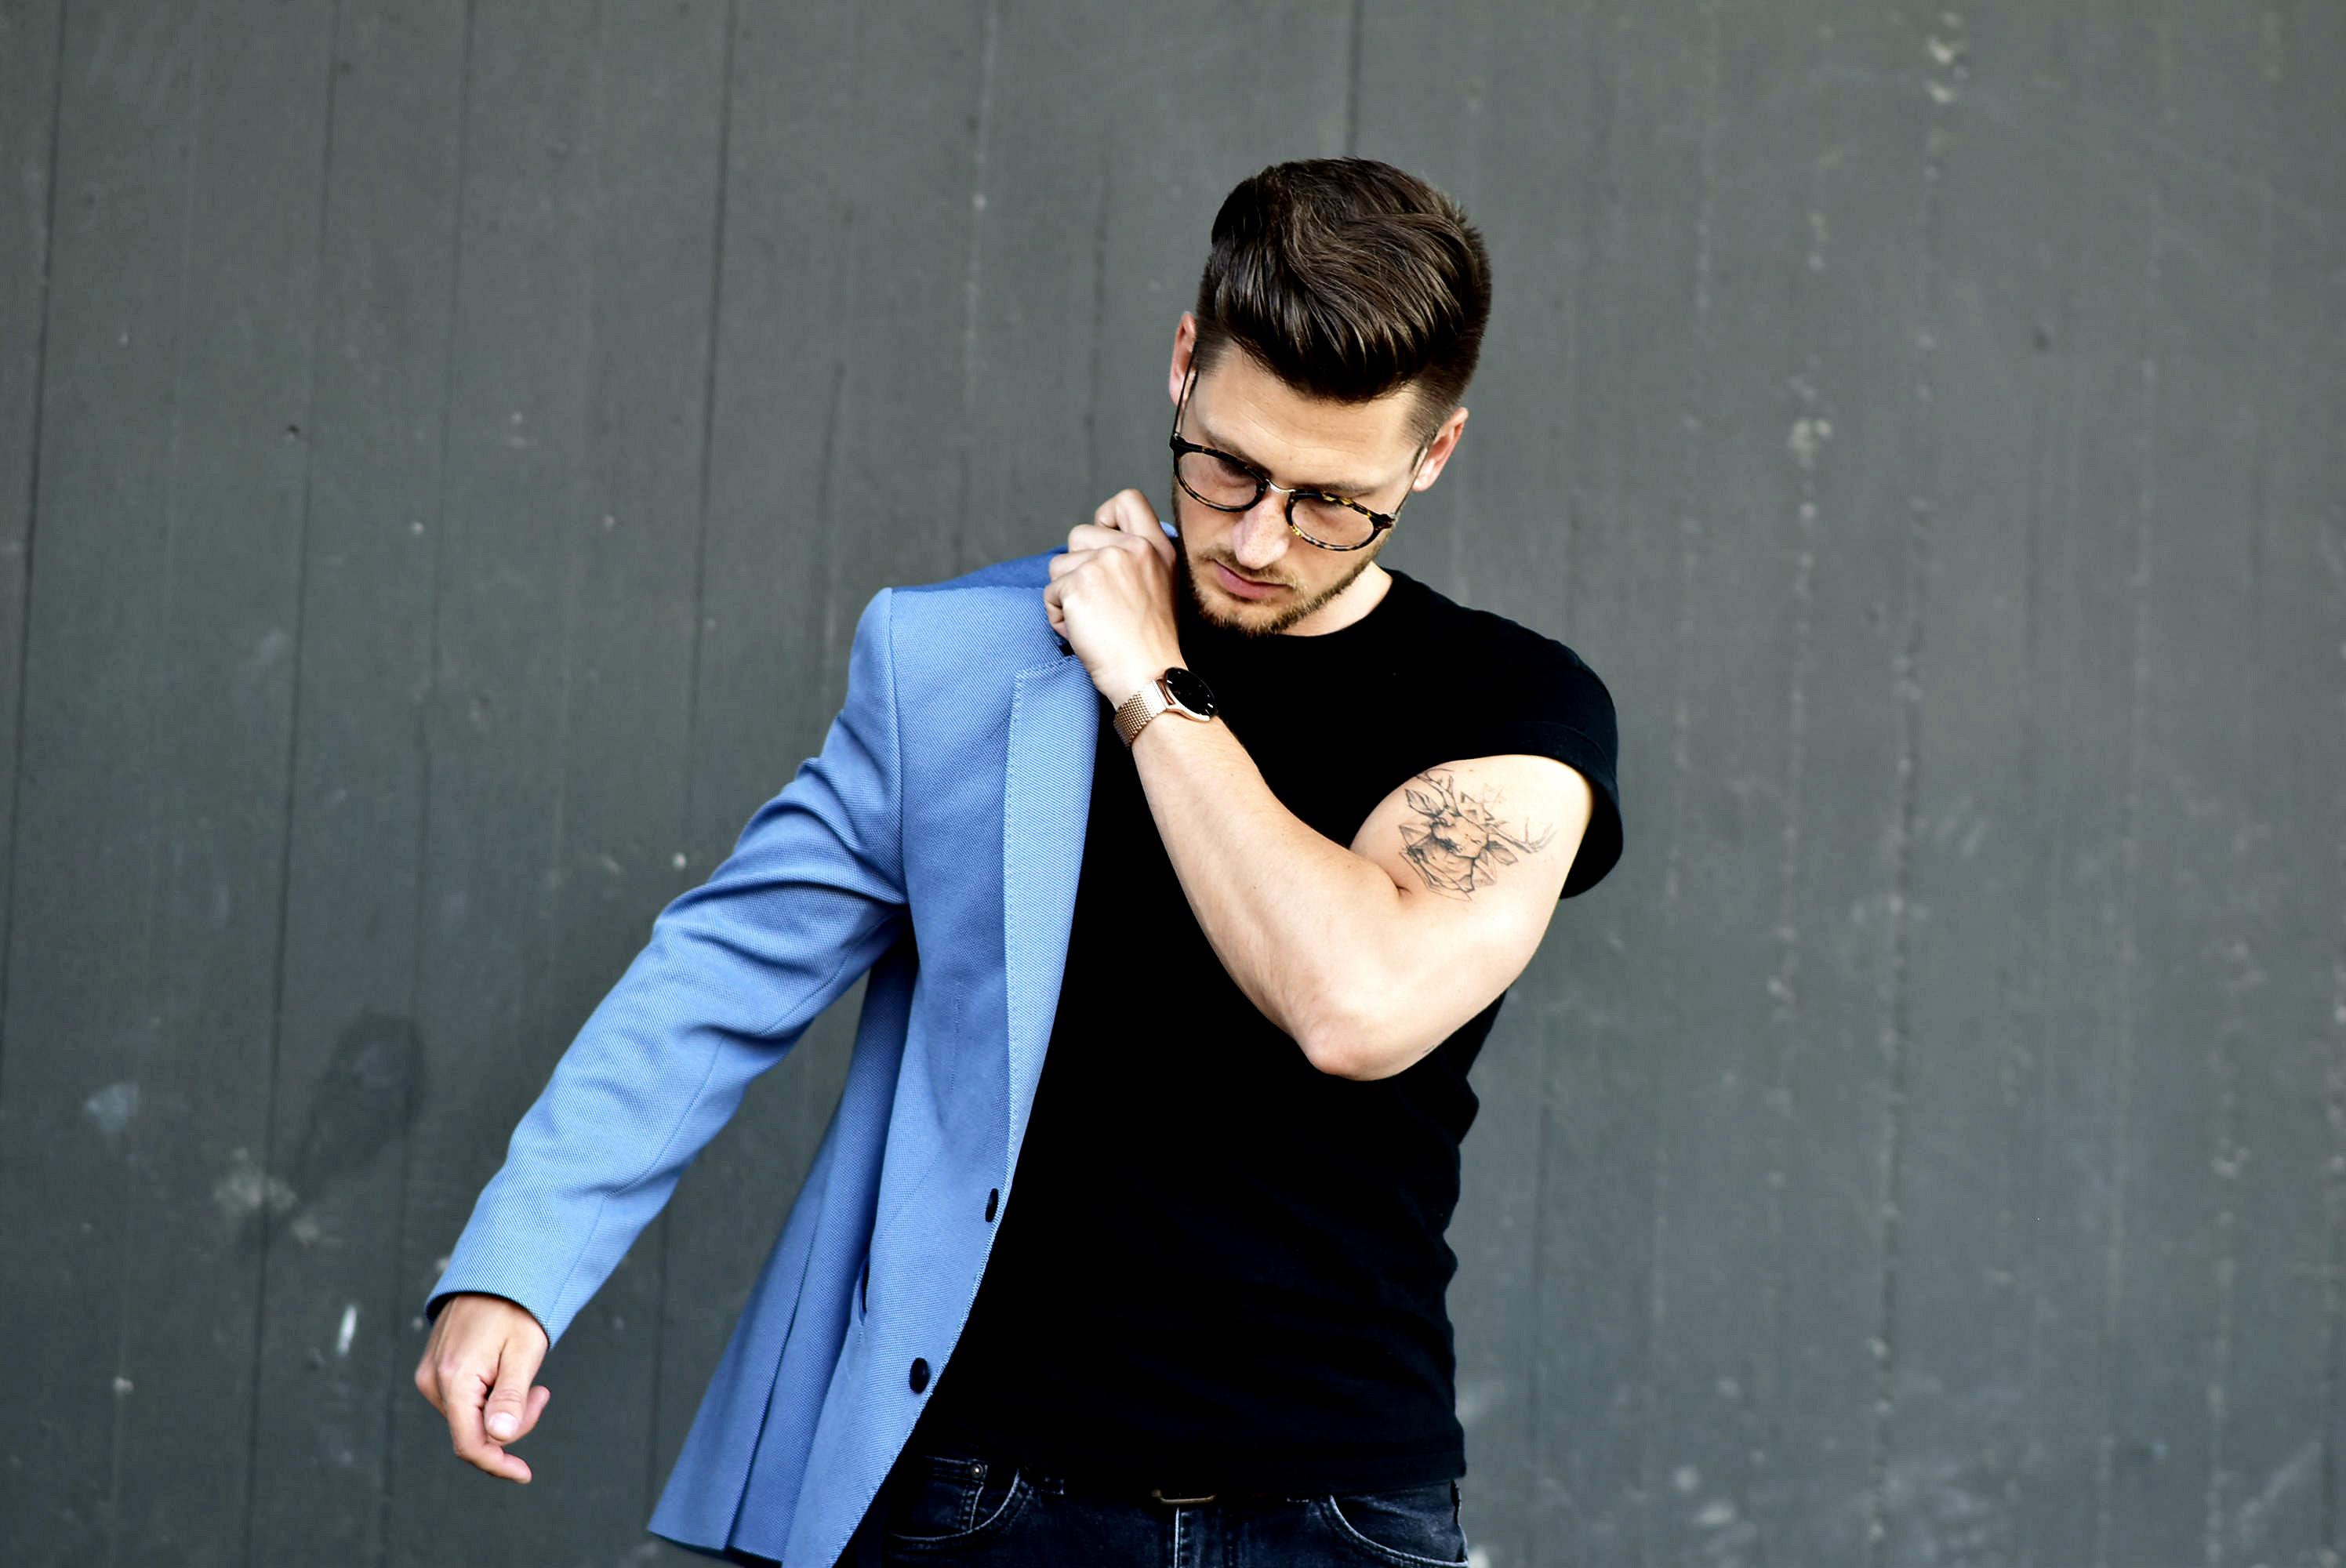 Tommeezjerry-Styleblog-Männerblog-Männer-Modeblog-Berlin-Berlinblog-Outfit-Streetlook-Royalblauer-Blazer-Royalblue-All-Black-Look-Chelsea-Boots-Skinny-Jeans-6